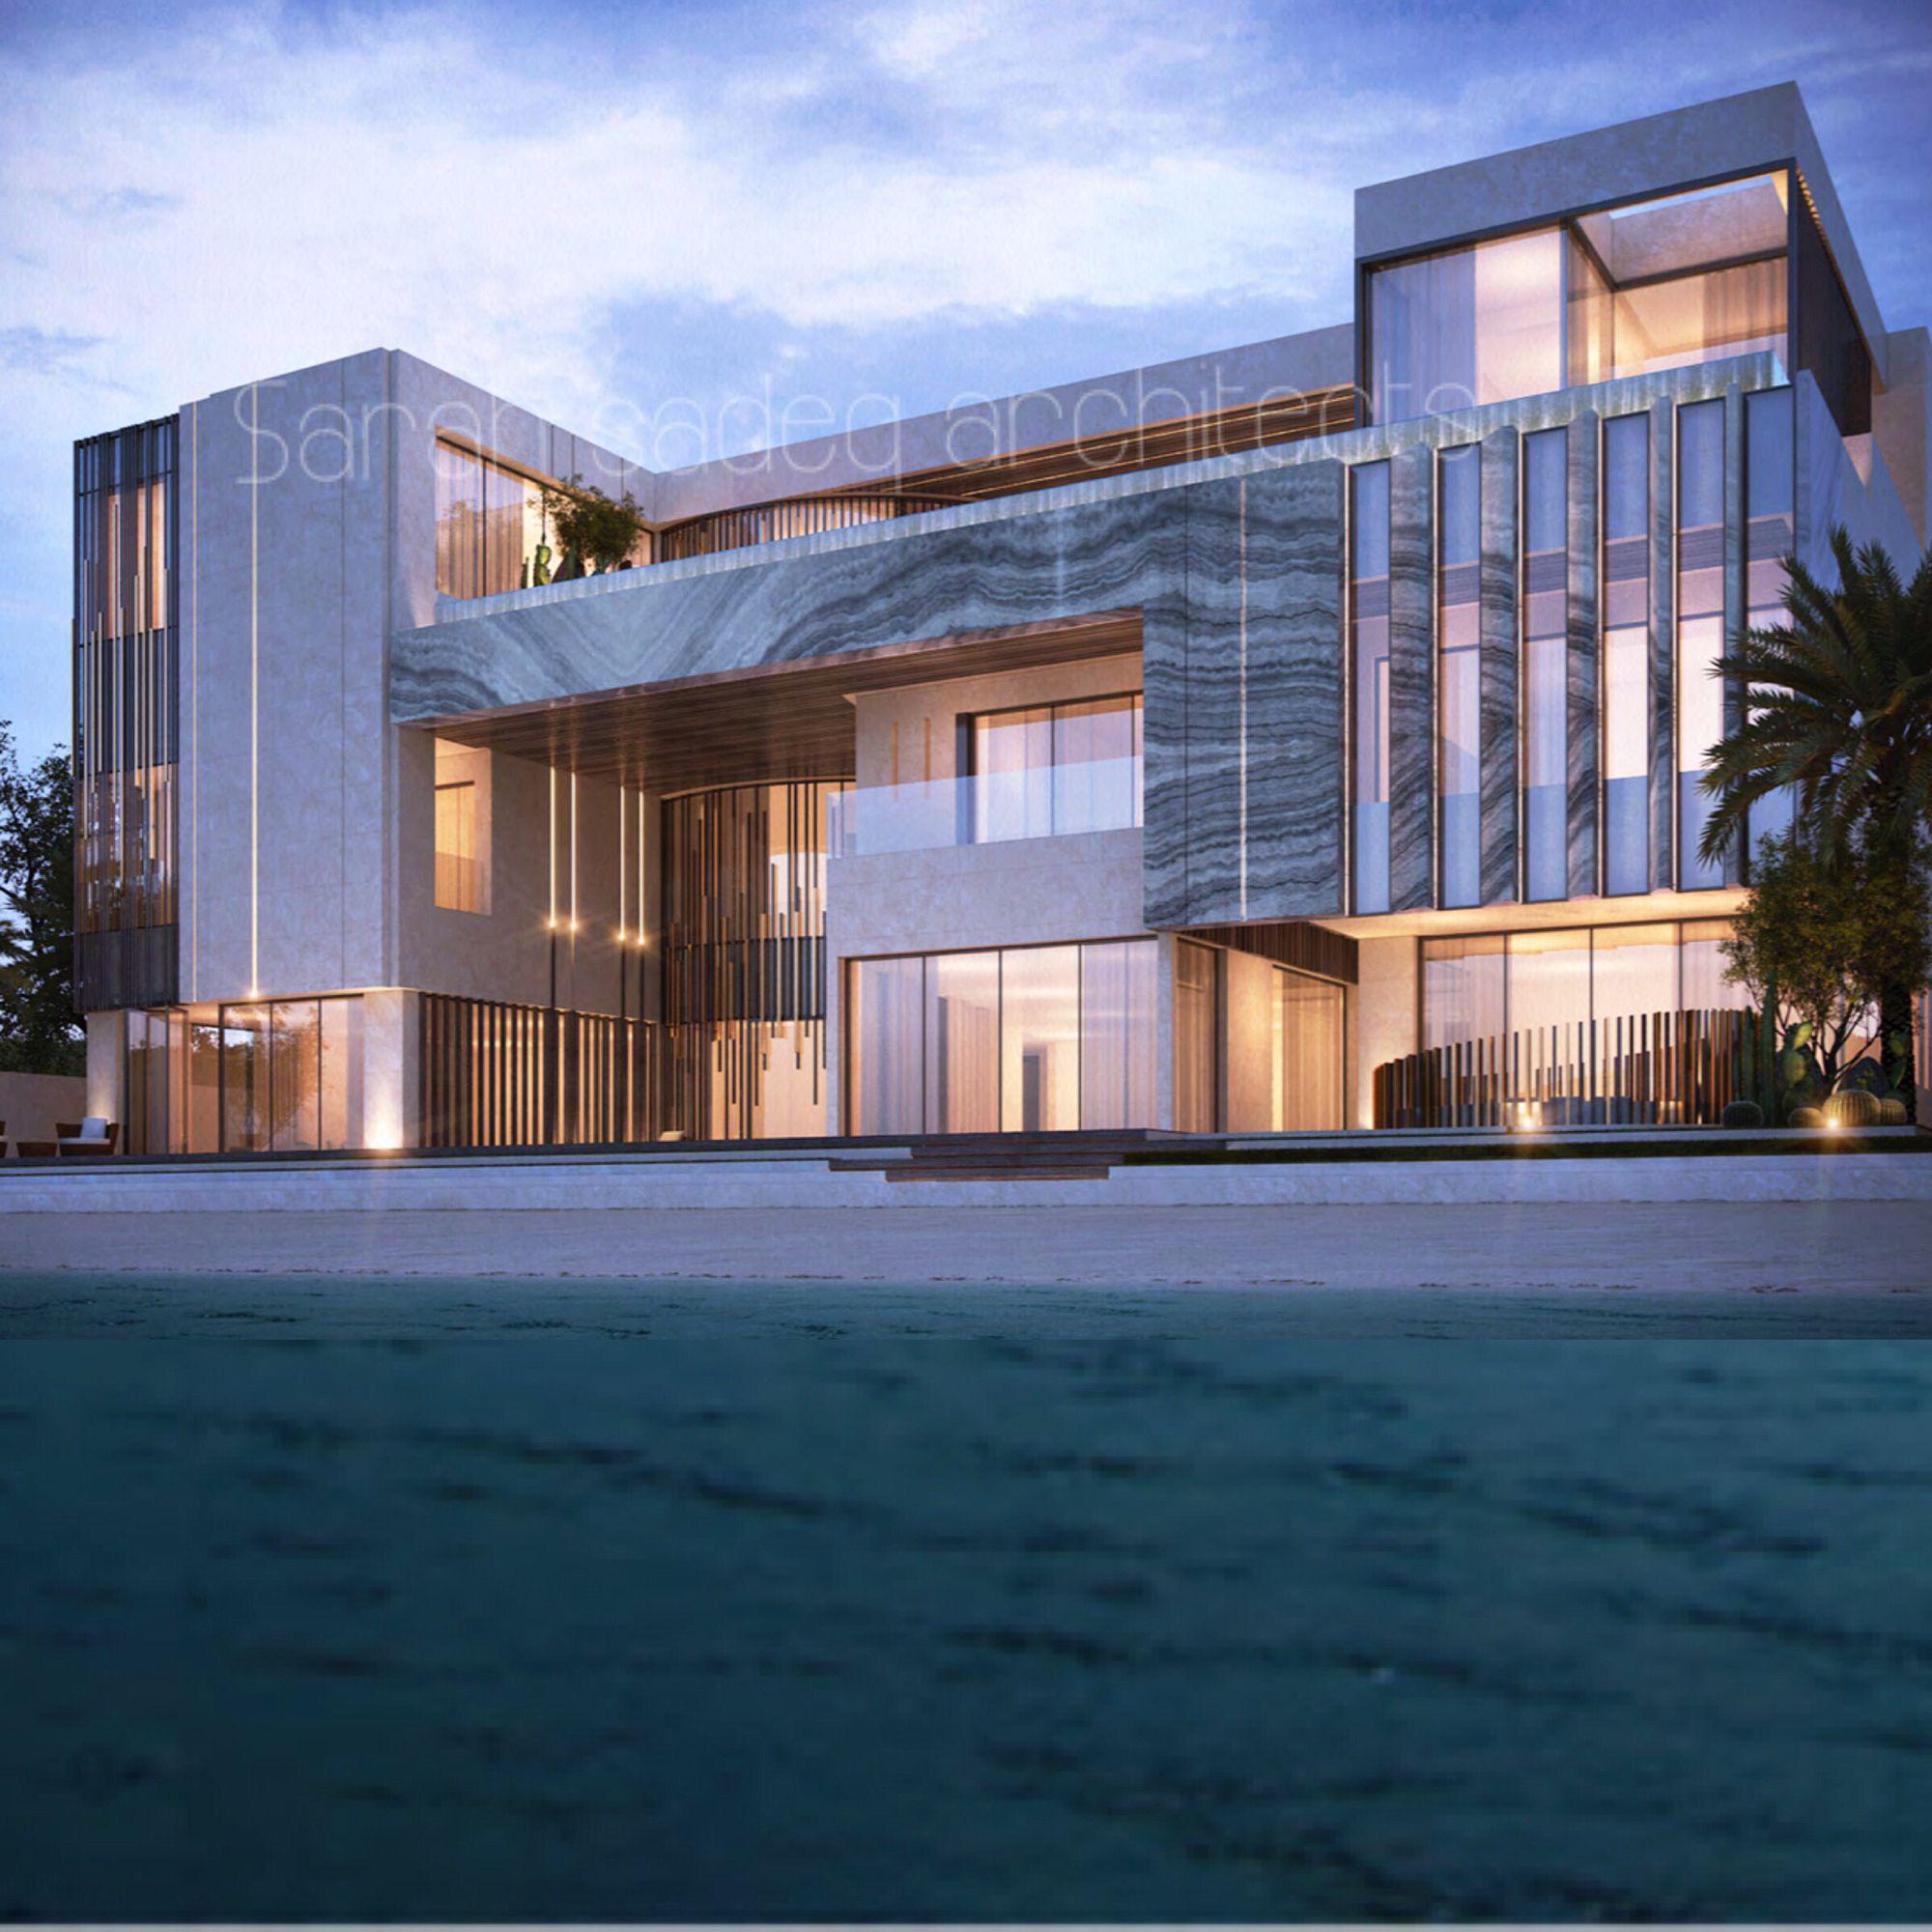 the palm jumaira dubai sarah sadeq architects sarah sadeq architectes pinterest arquitetura. Black Bedroom Furniture Sets. Home Design Ideas